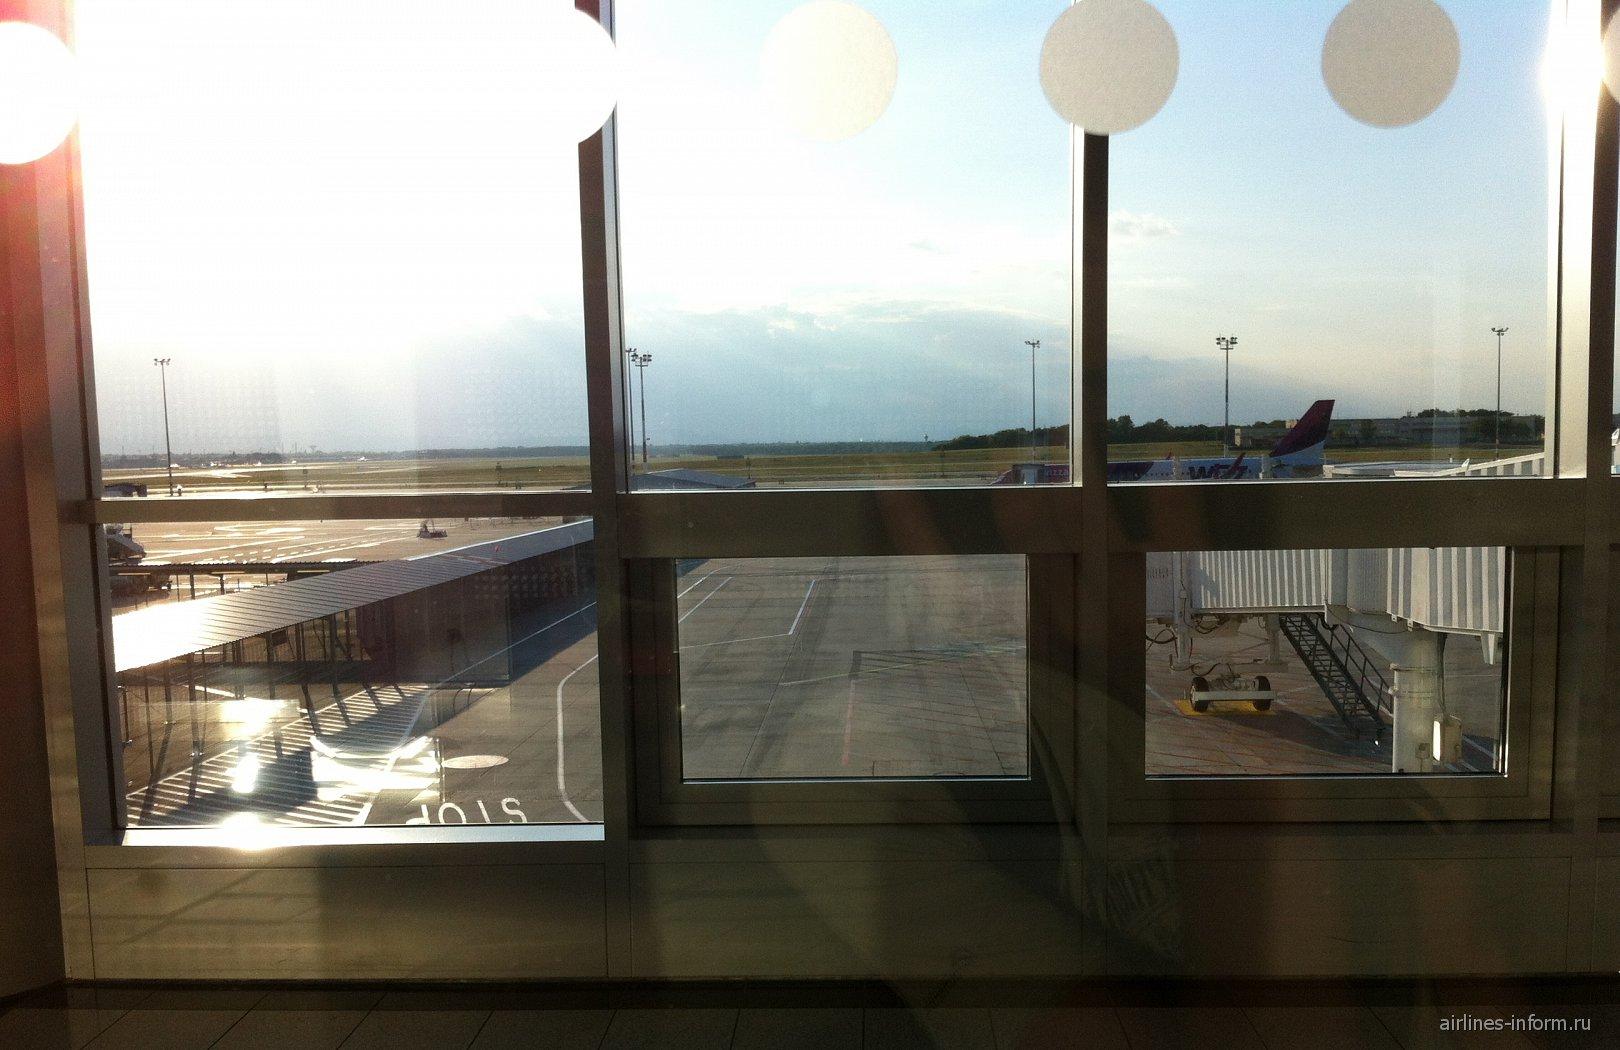 Перрон аэропорта